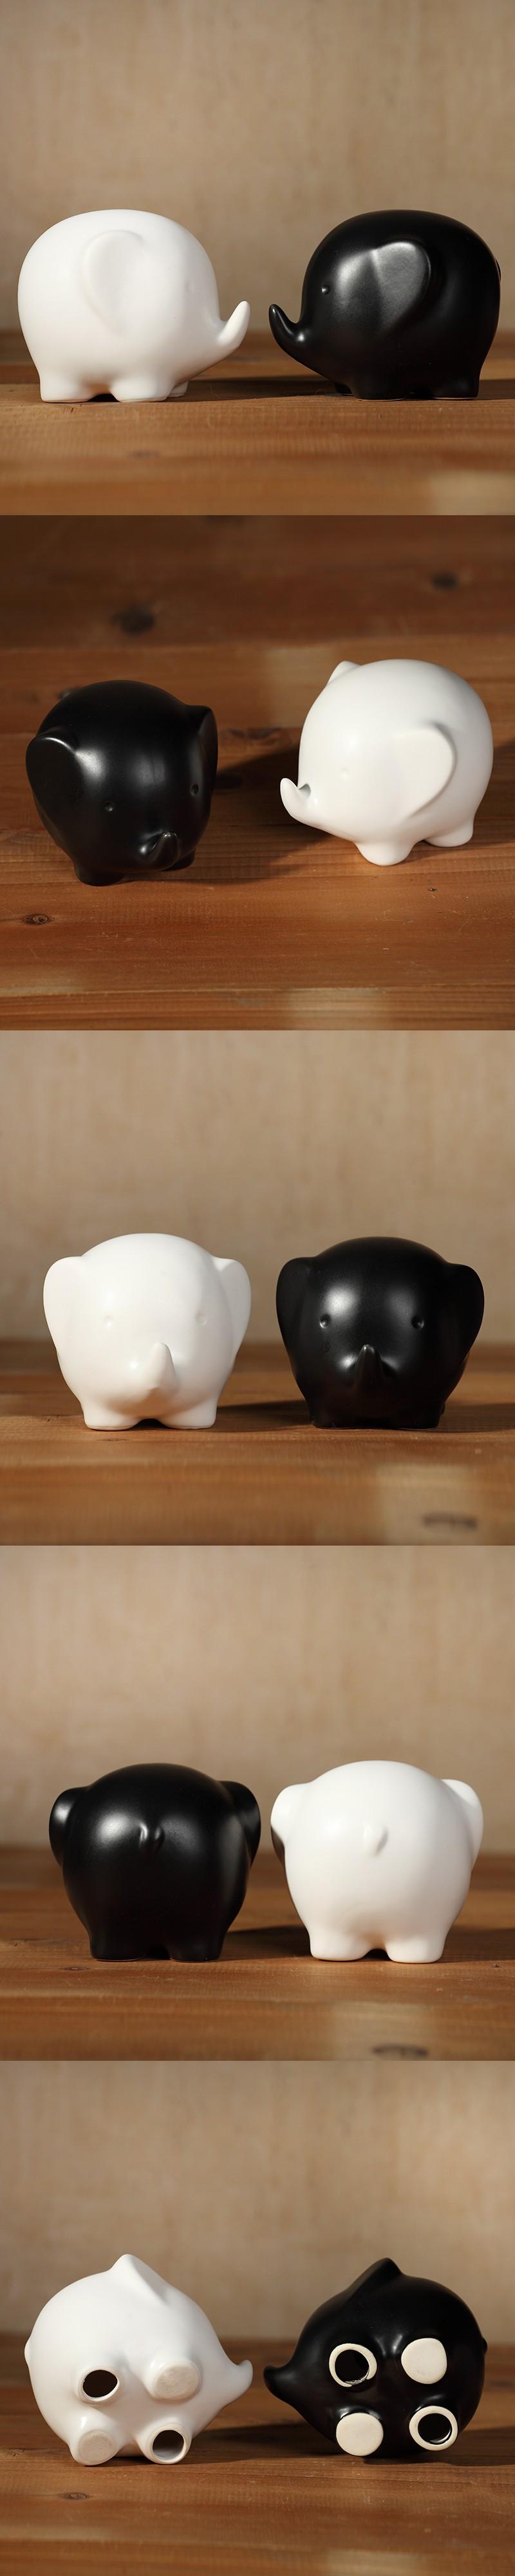 Living Room Craft Ceramic Objects Ornaments Crafts Creative Modern Minimalist Living